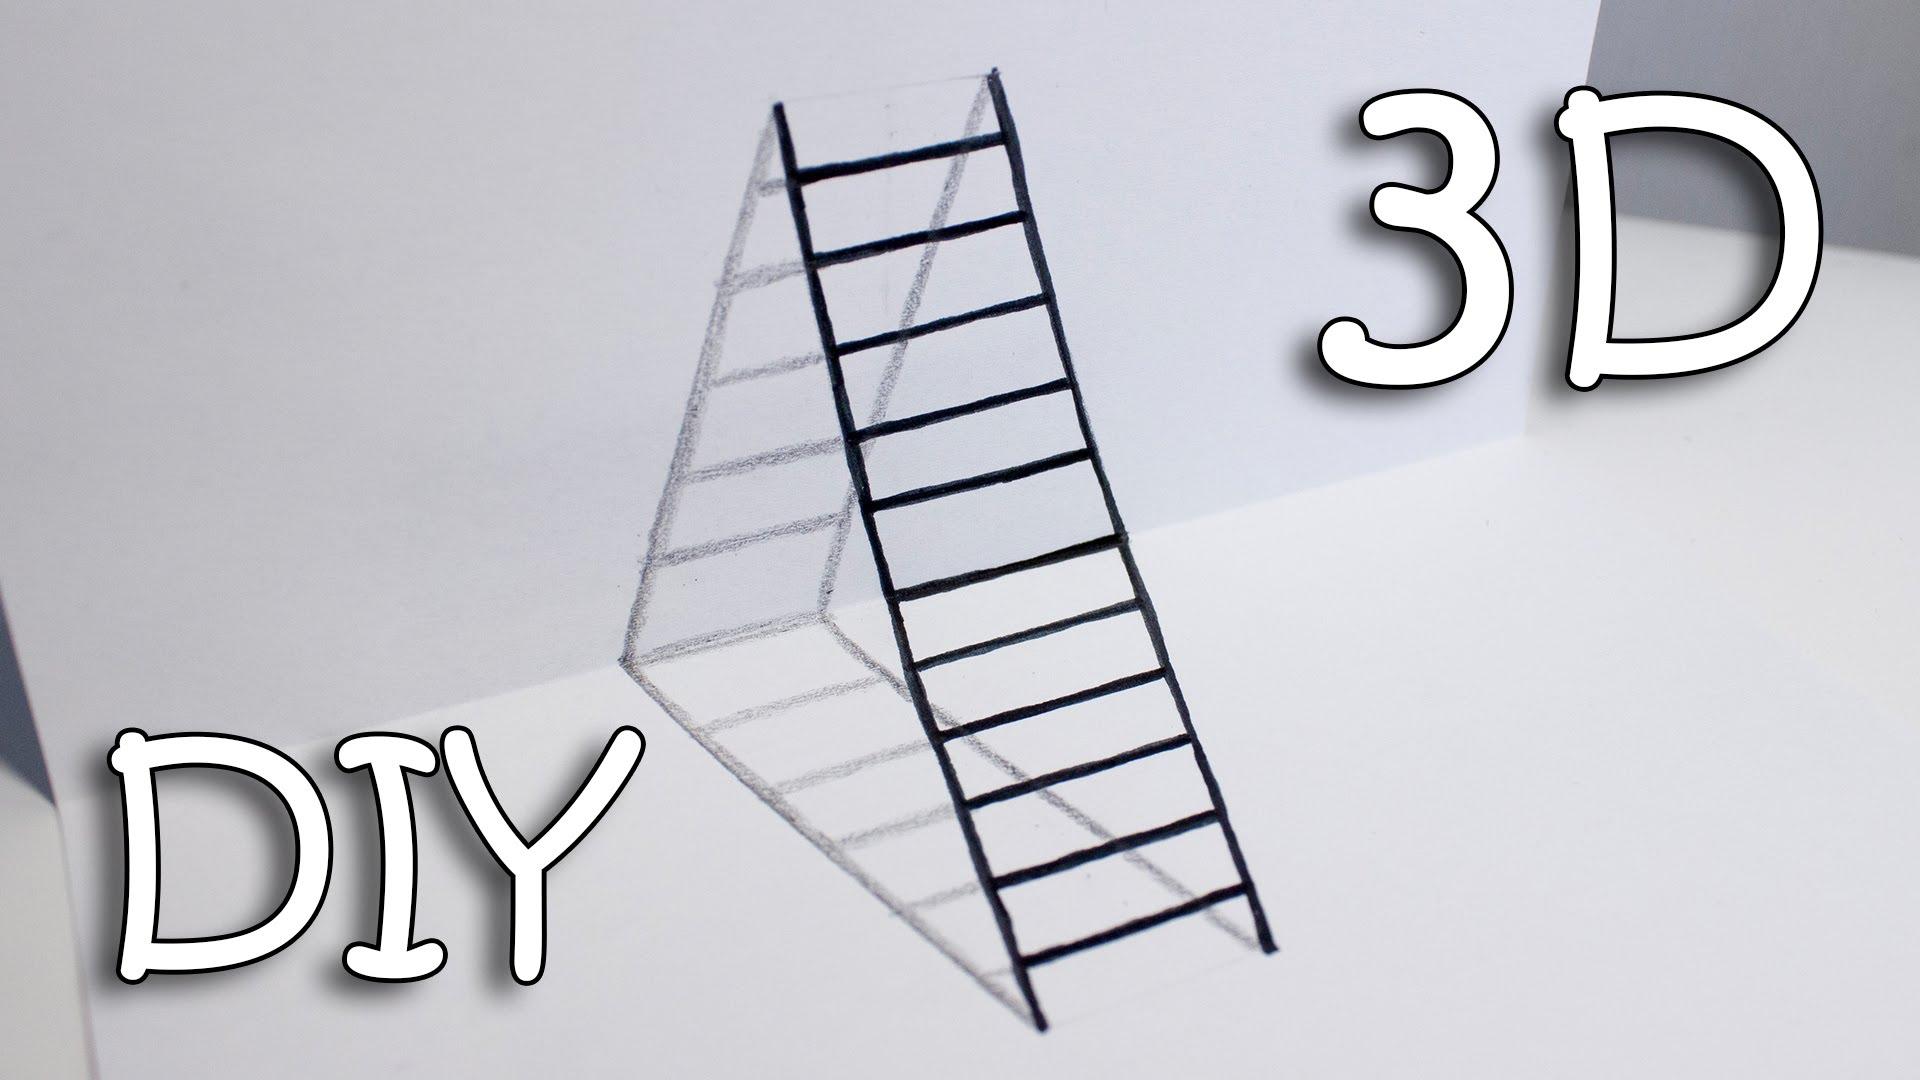 Drawn optical illusion hard To Ladder How Draw Ladder